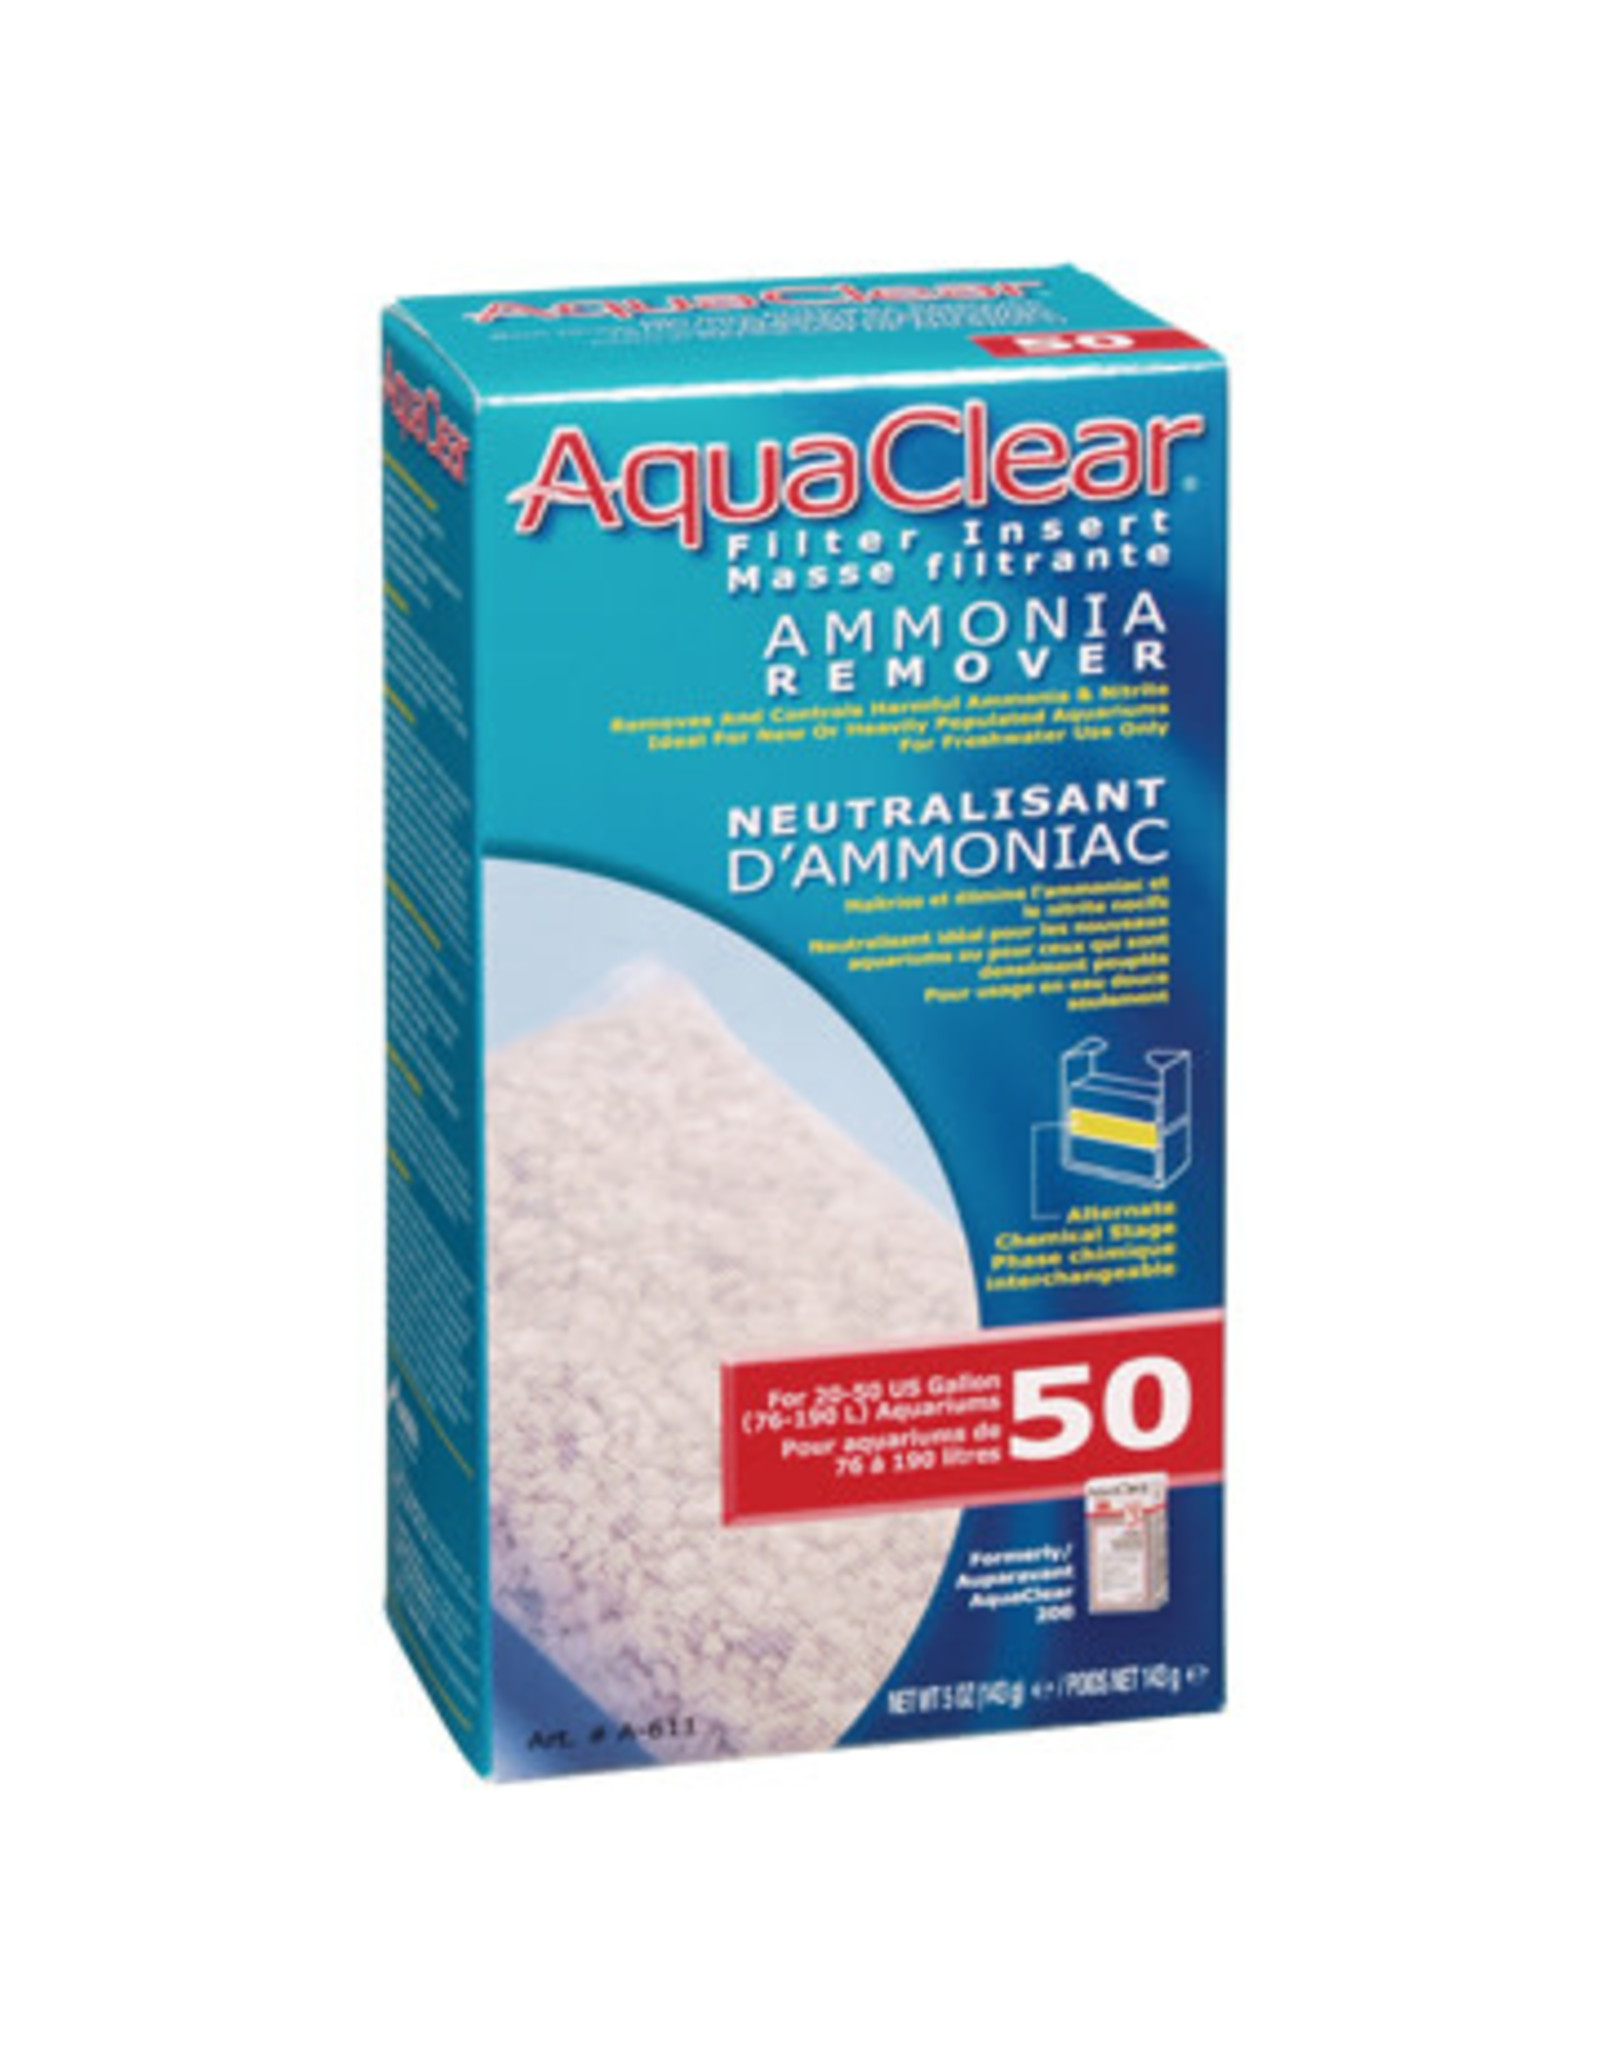 AquaClear AquaClear 50 Ammonia Remover Filter Insert 143g